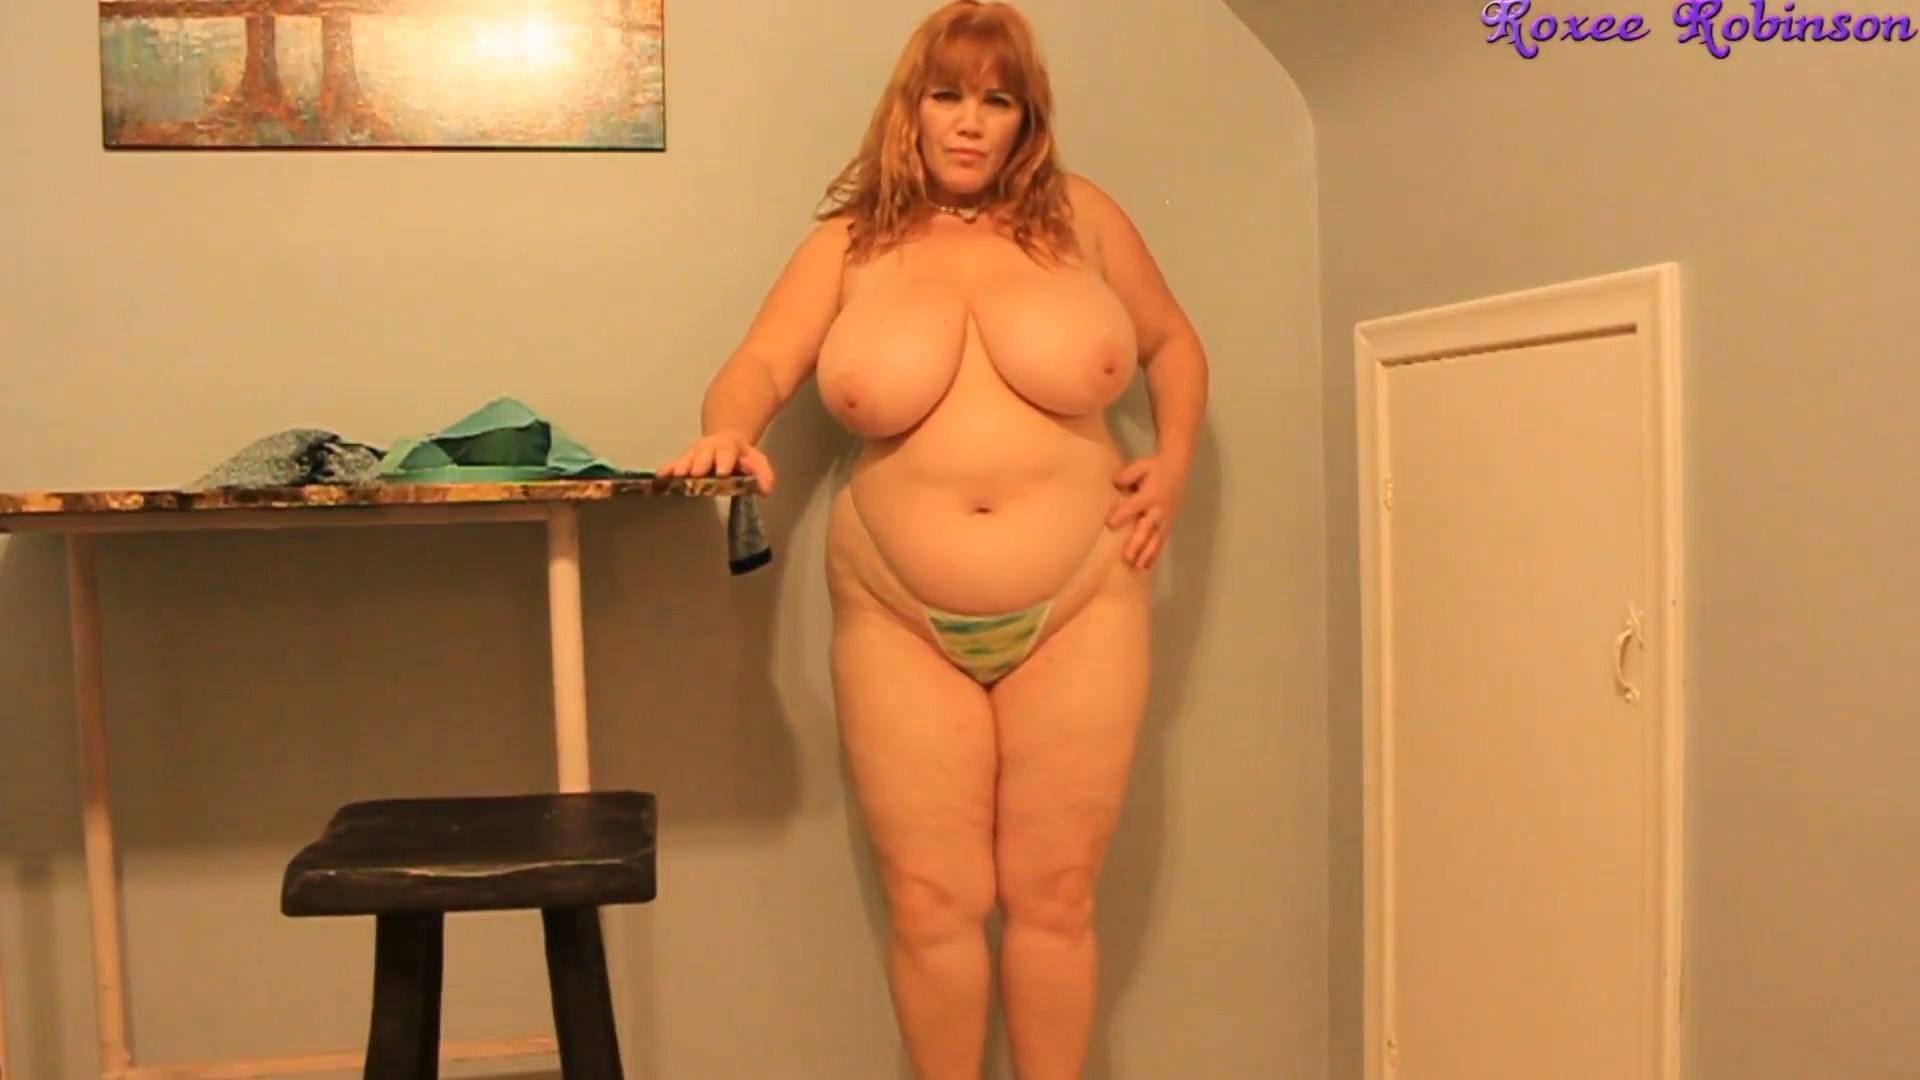 Roxee Robinson - Sexy Mommy Strip Tease